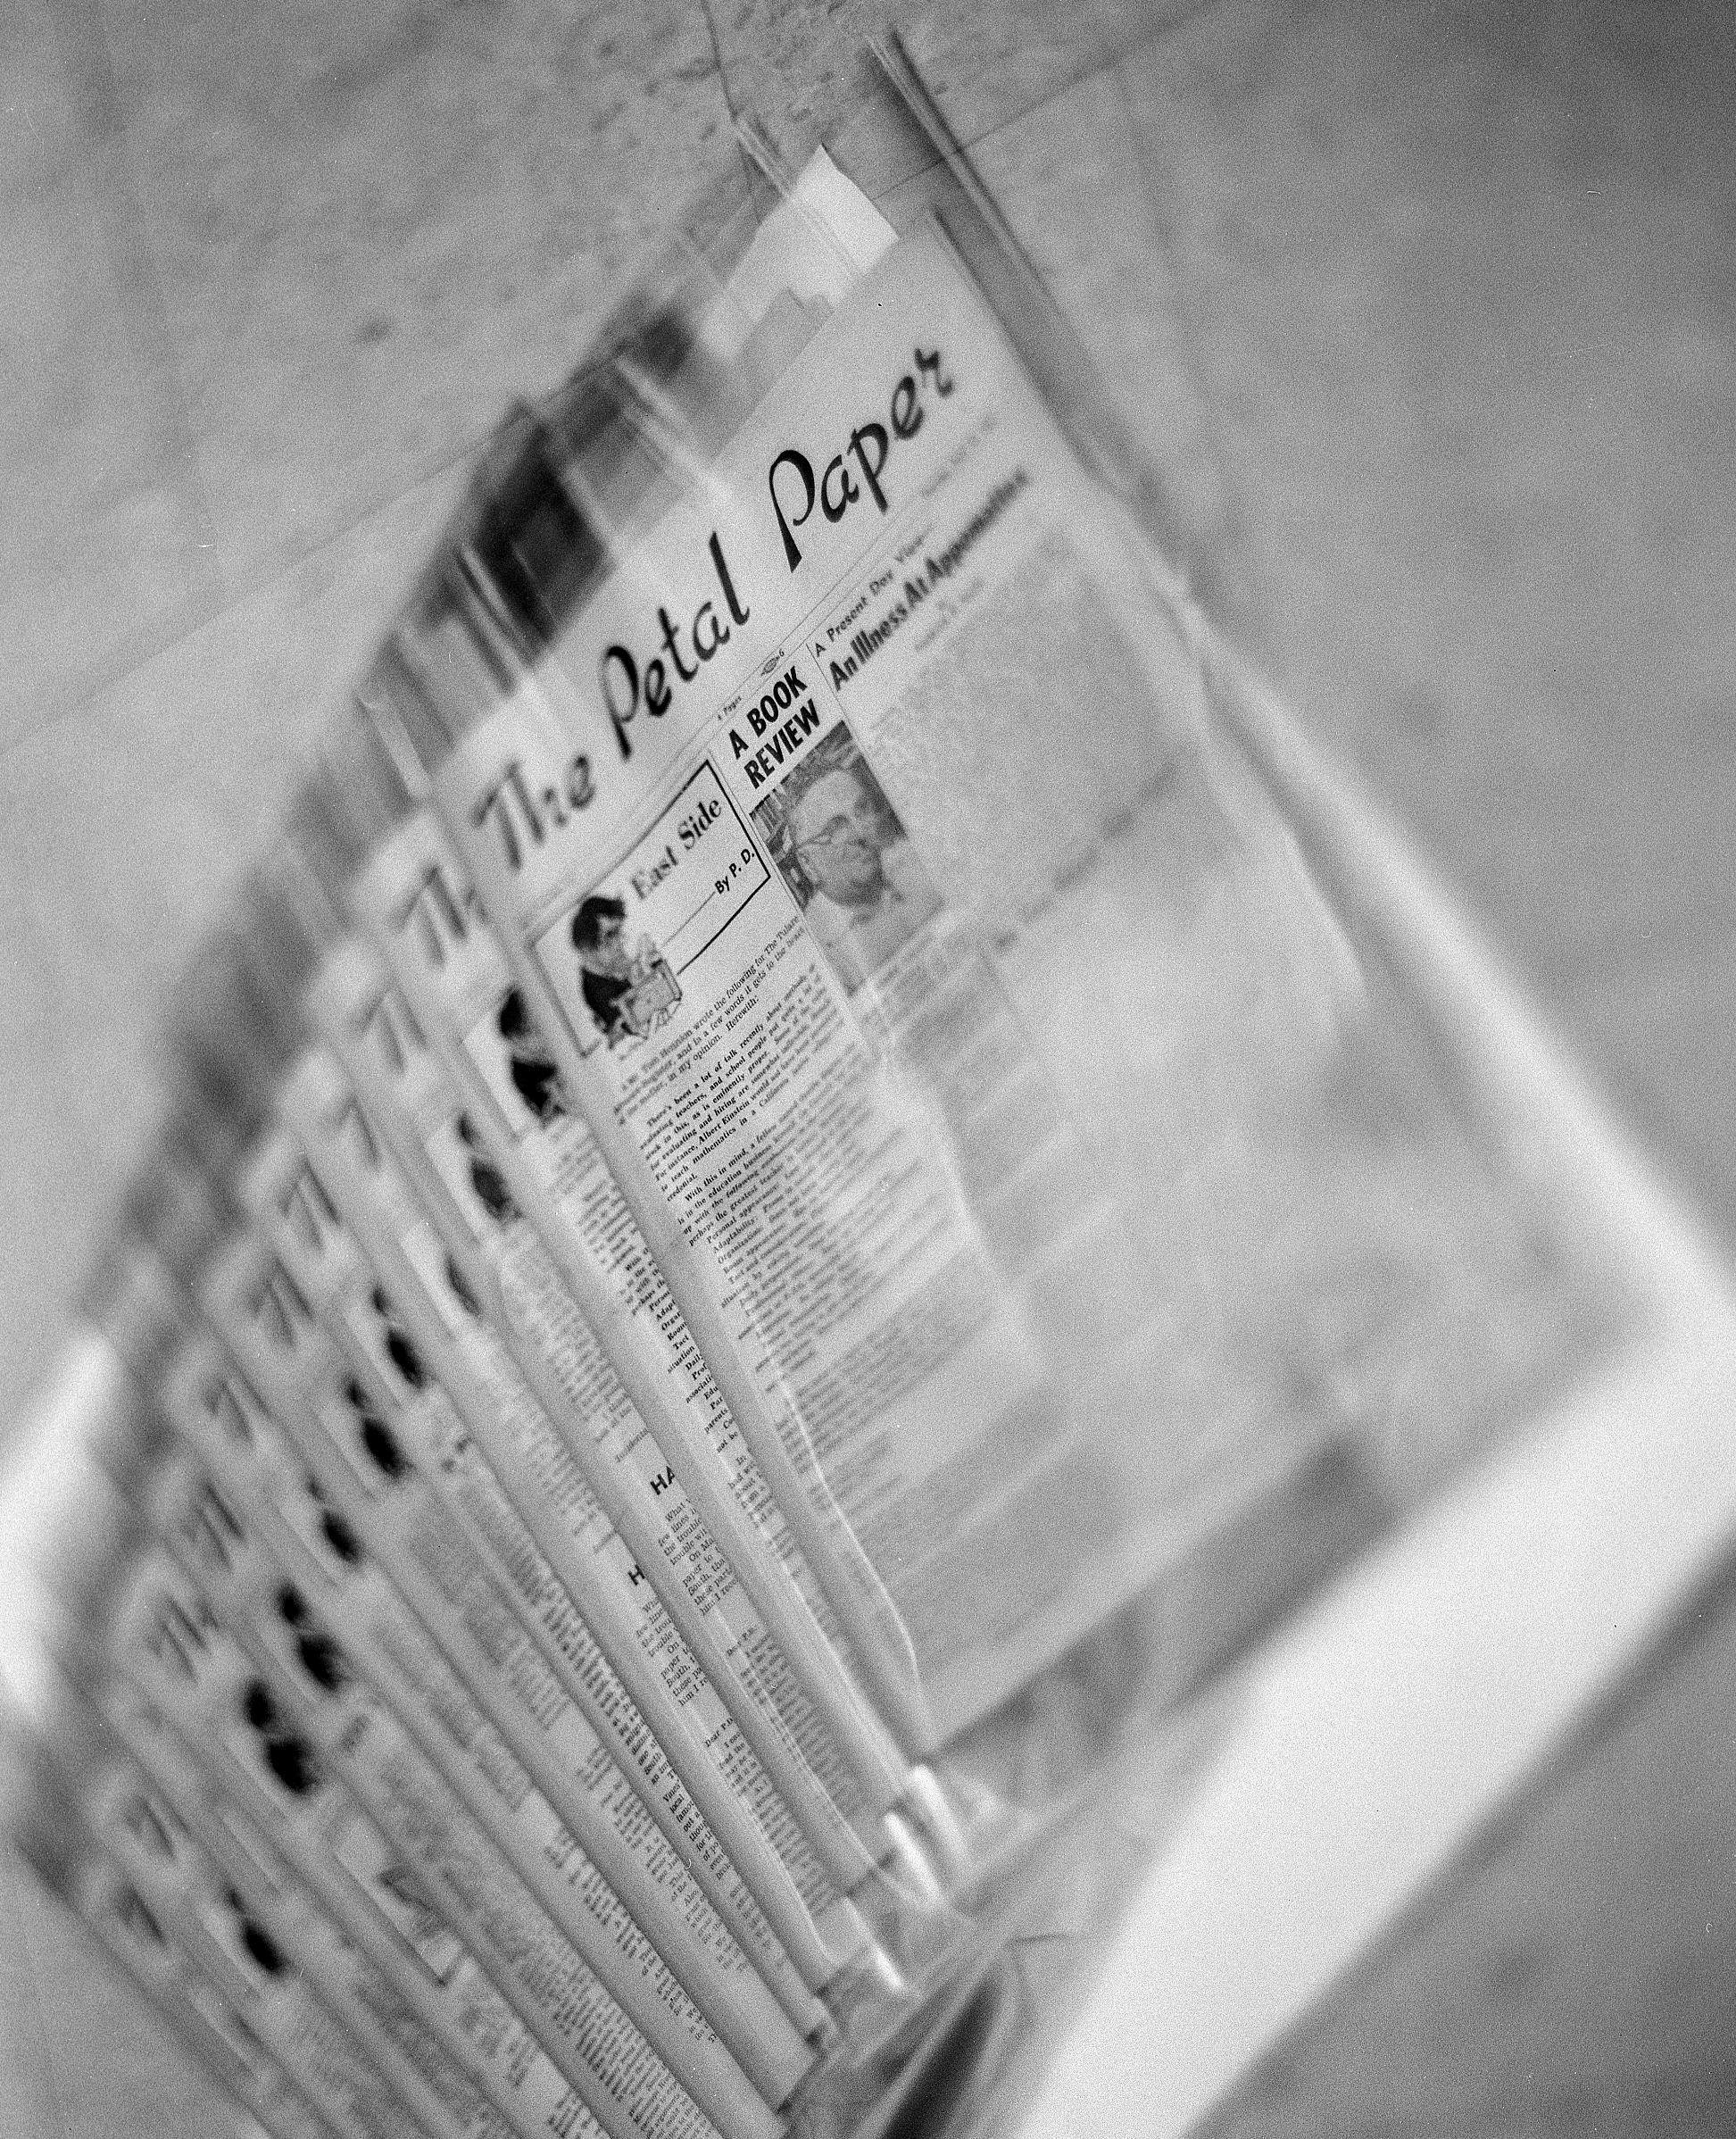 Preserved Petal Paper copies